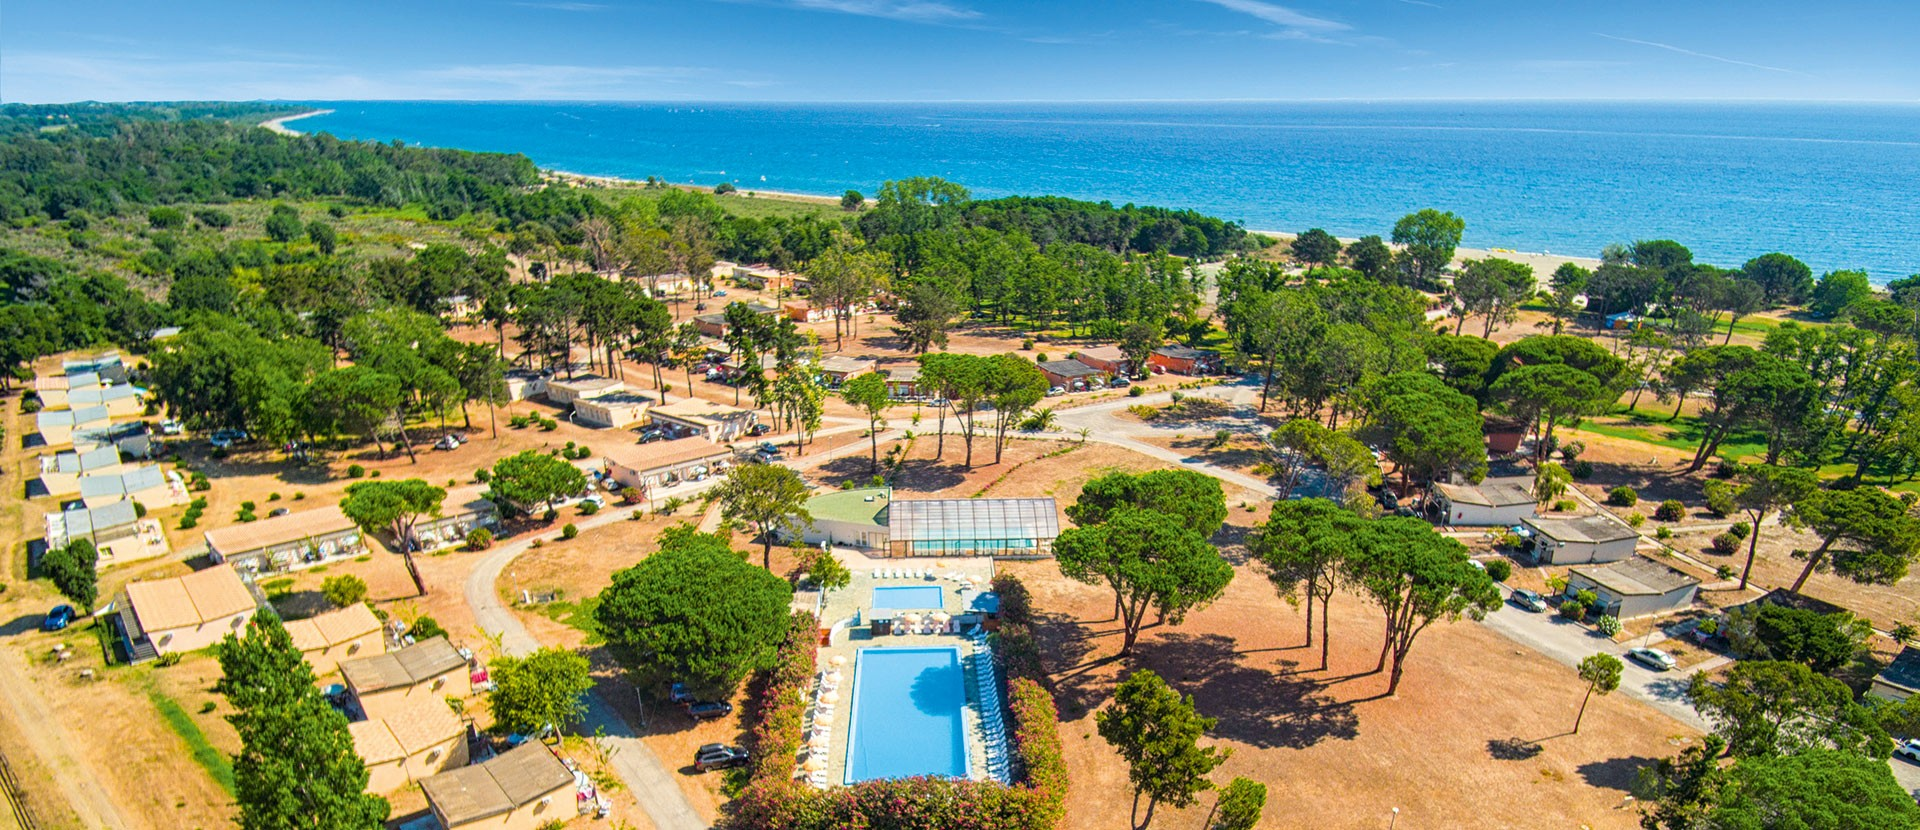 Les campings en Corse